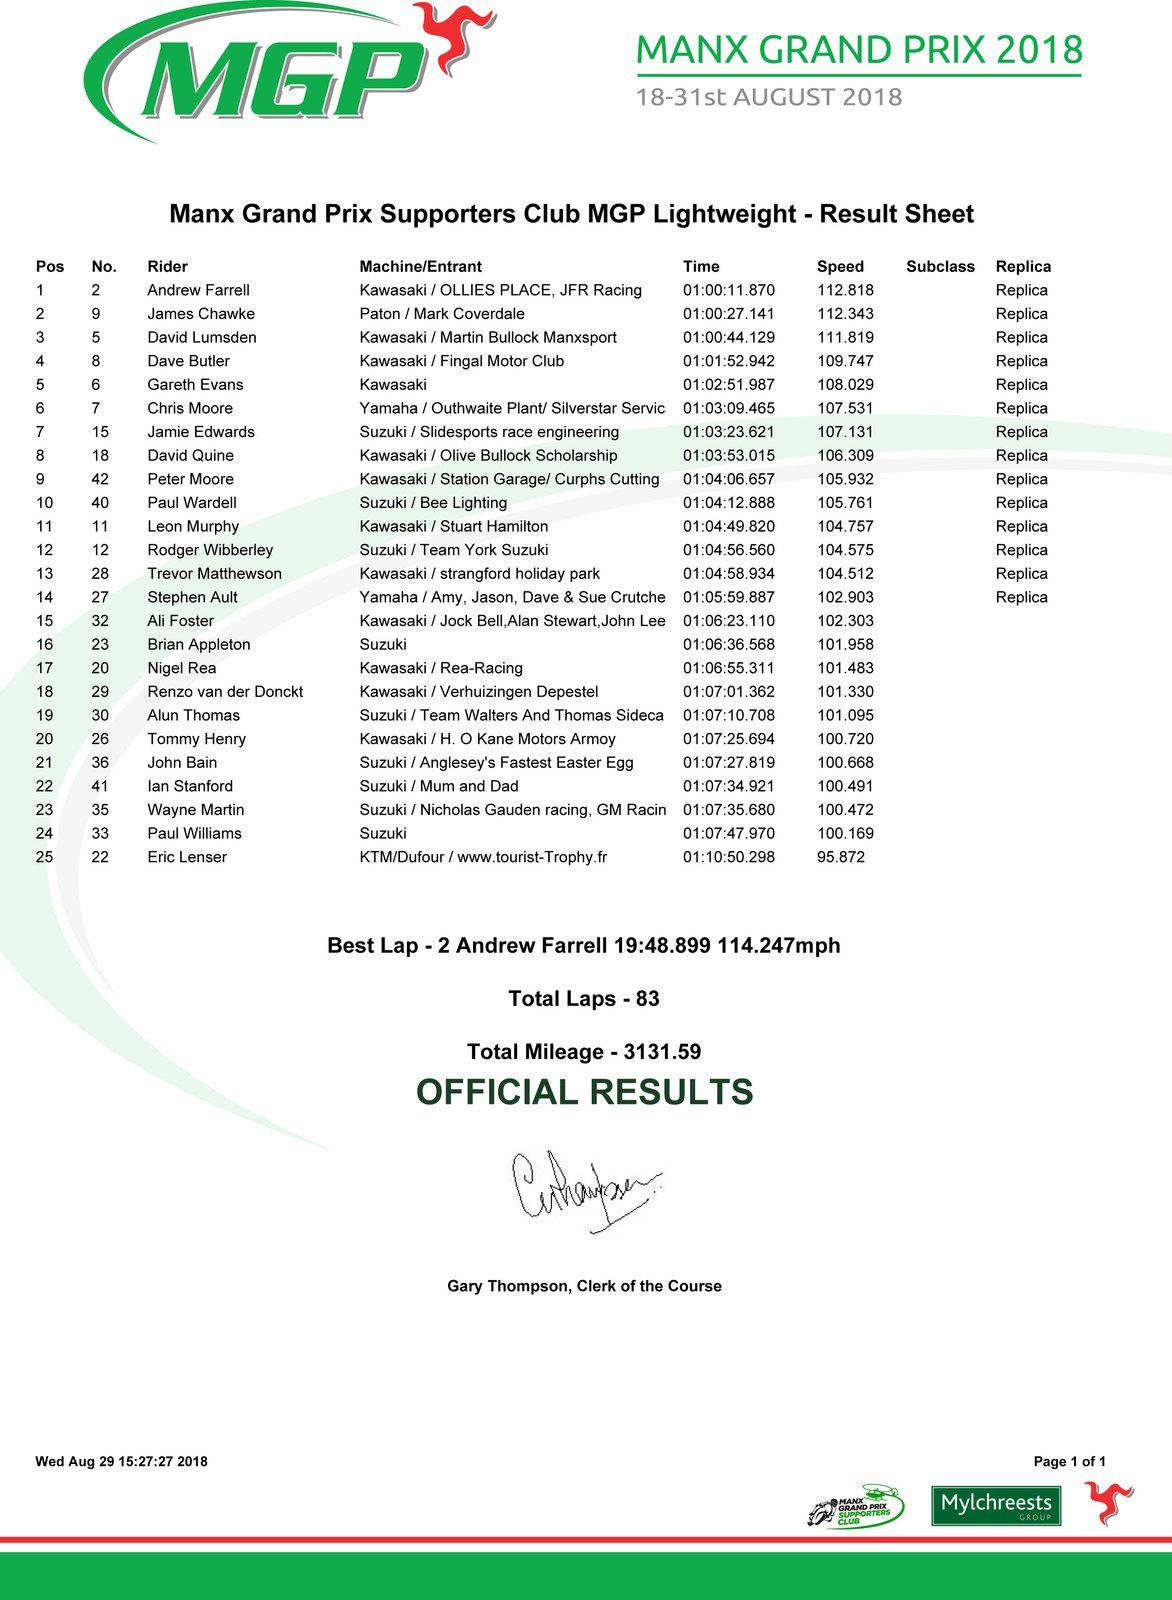 Manx GP lightweight race